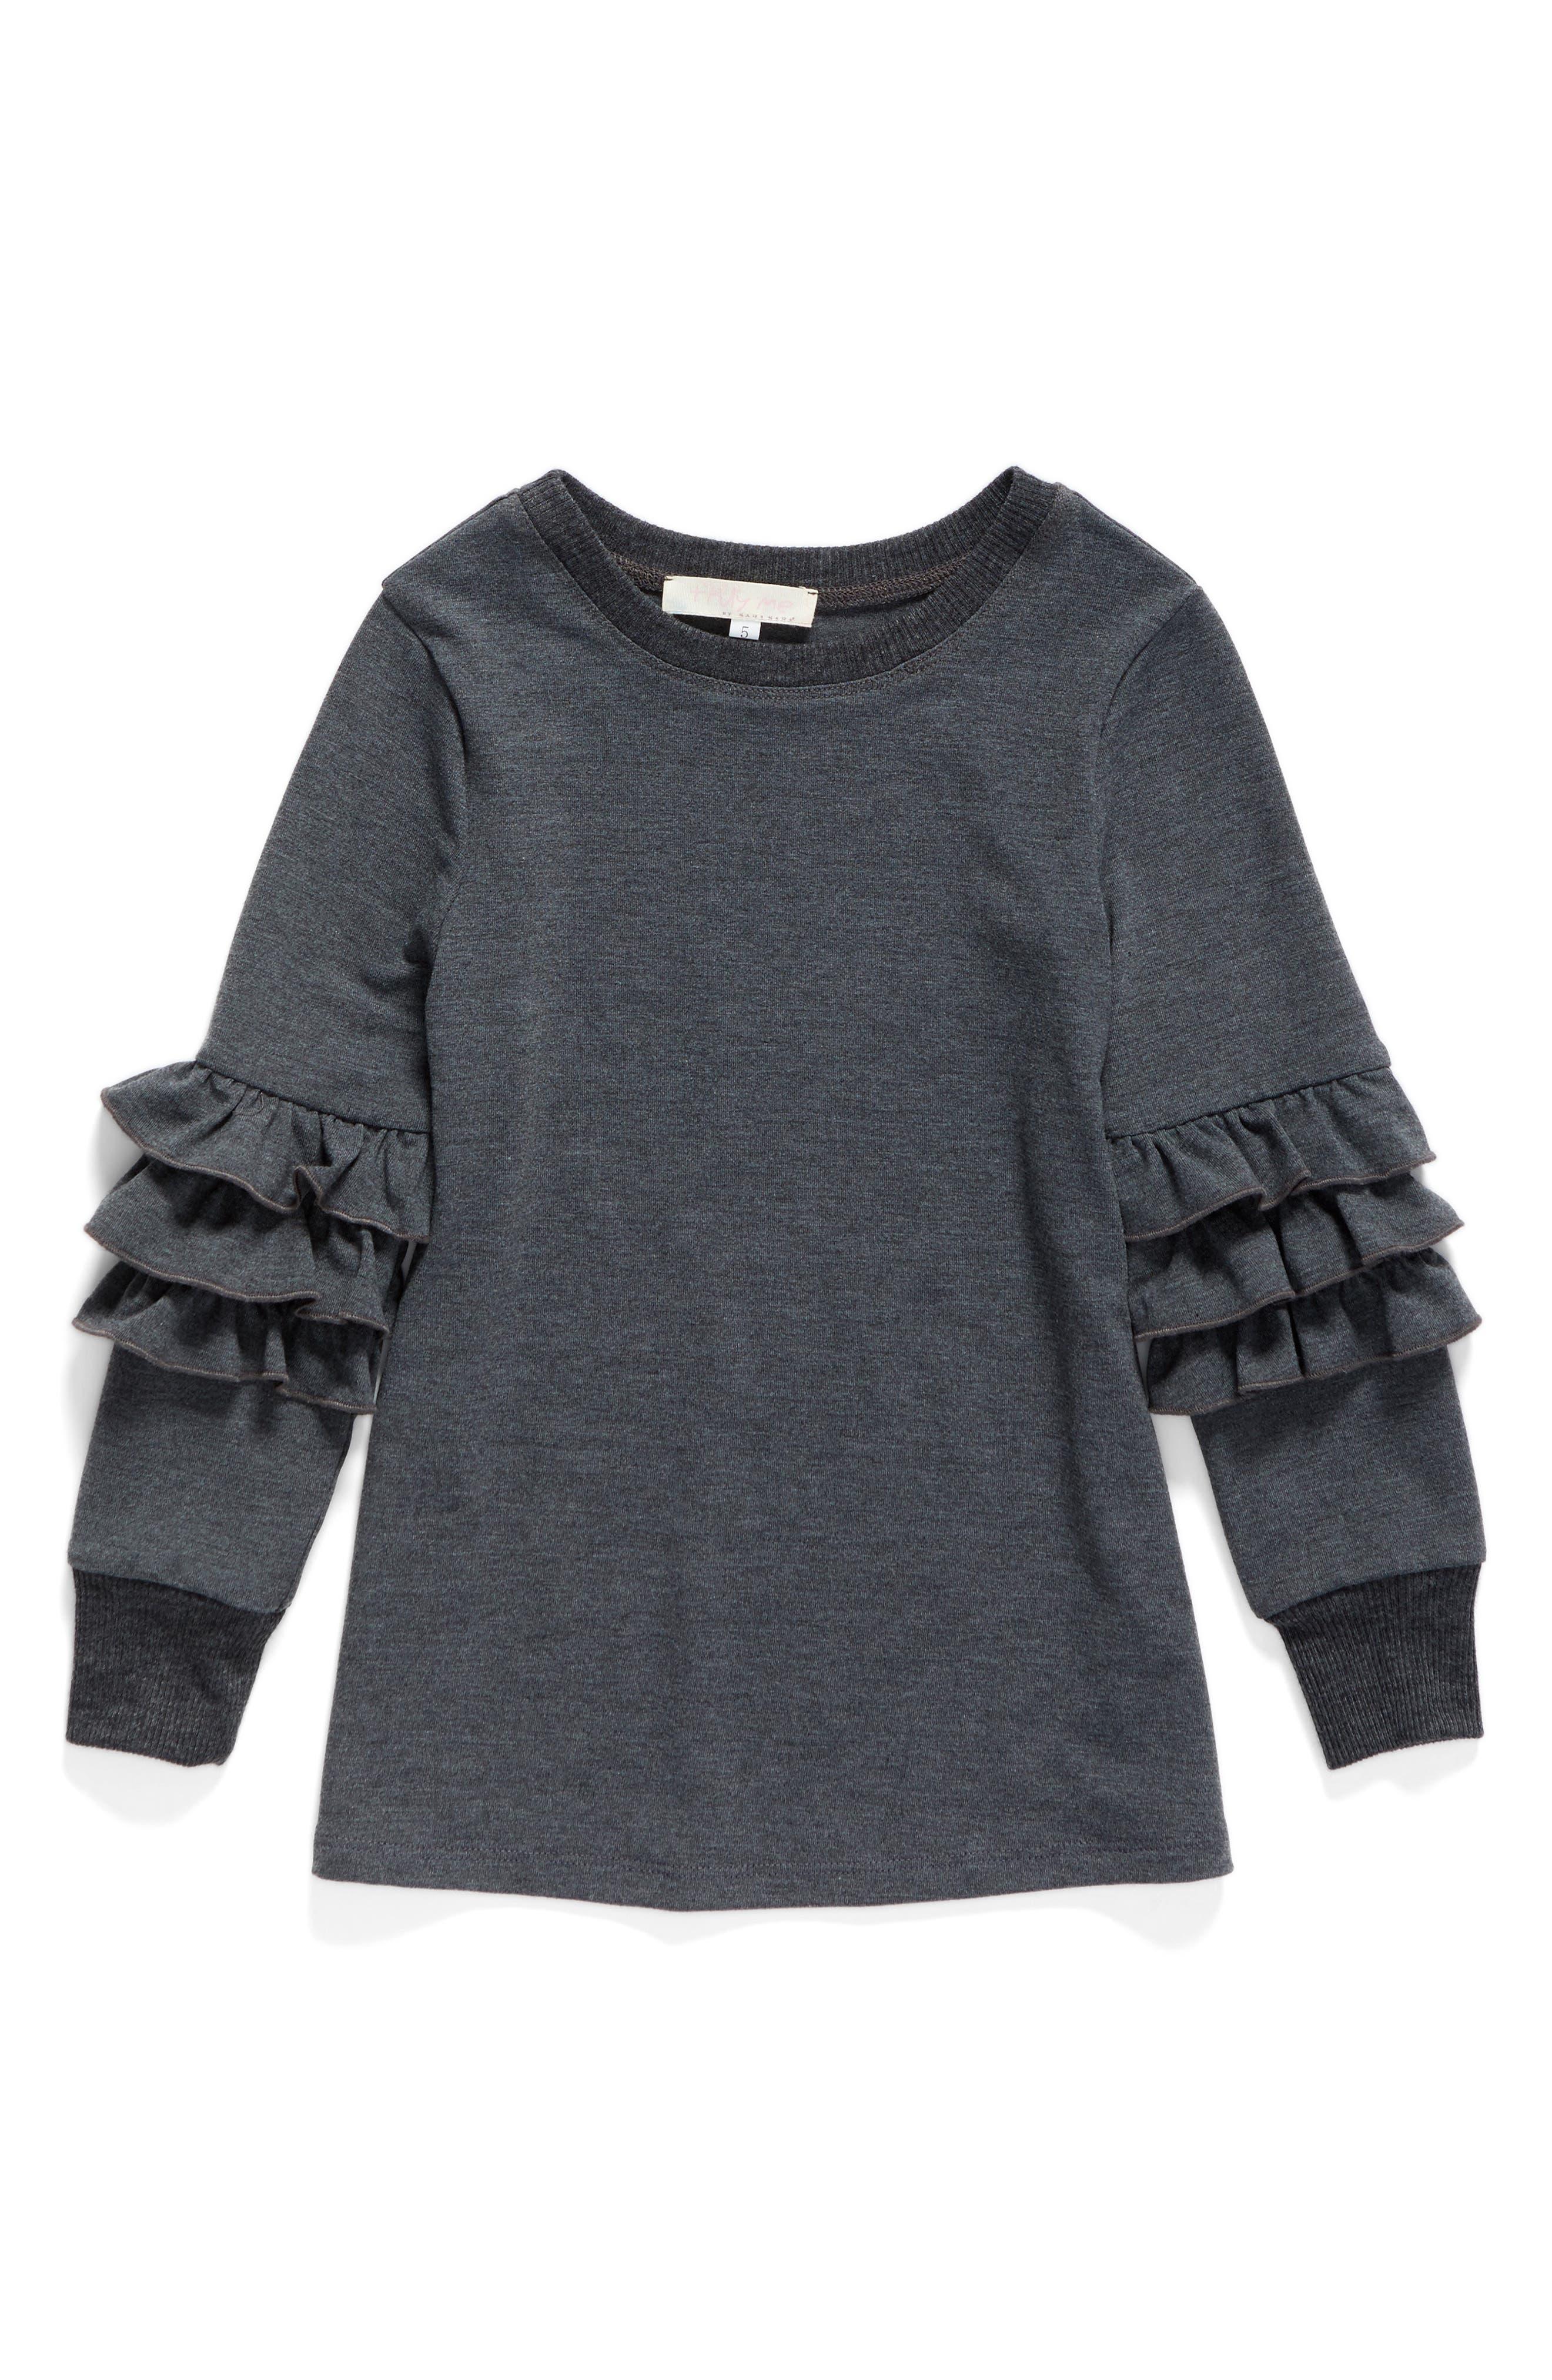 Ruffle Sleeve Sweatshirt,                             Main thumbnail 1, color,                             023